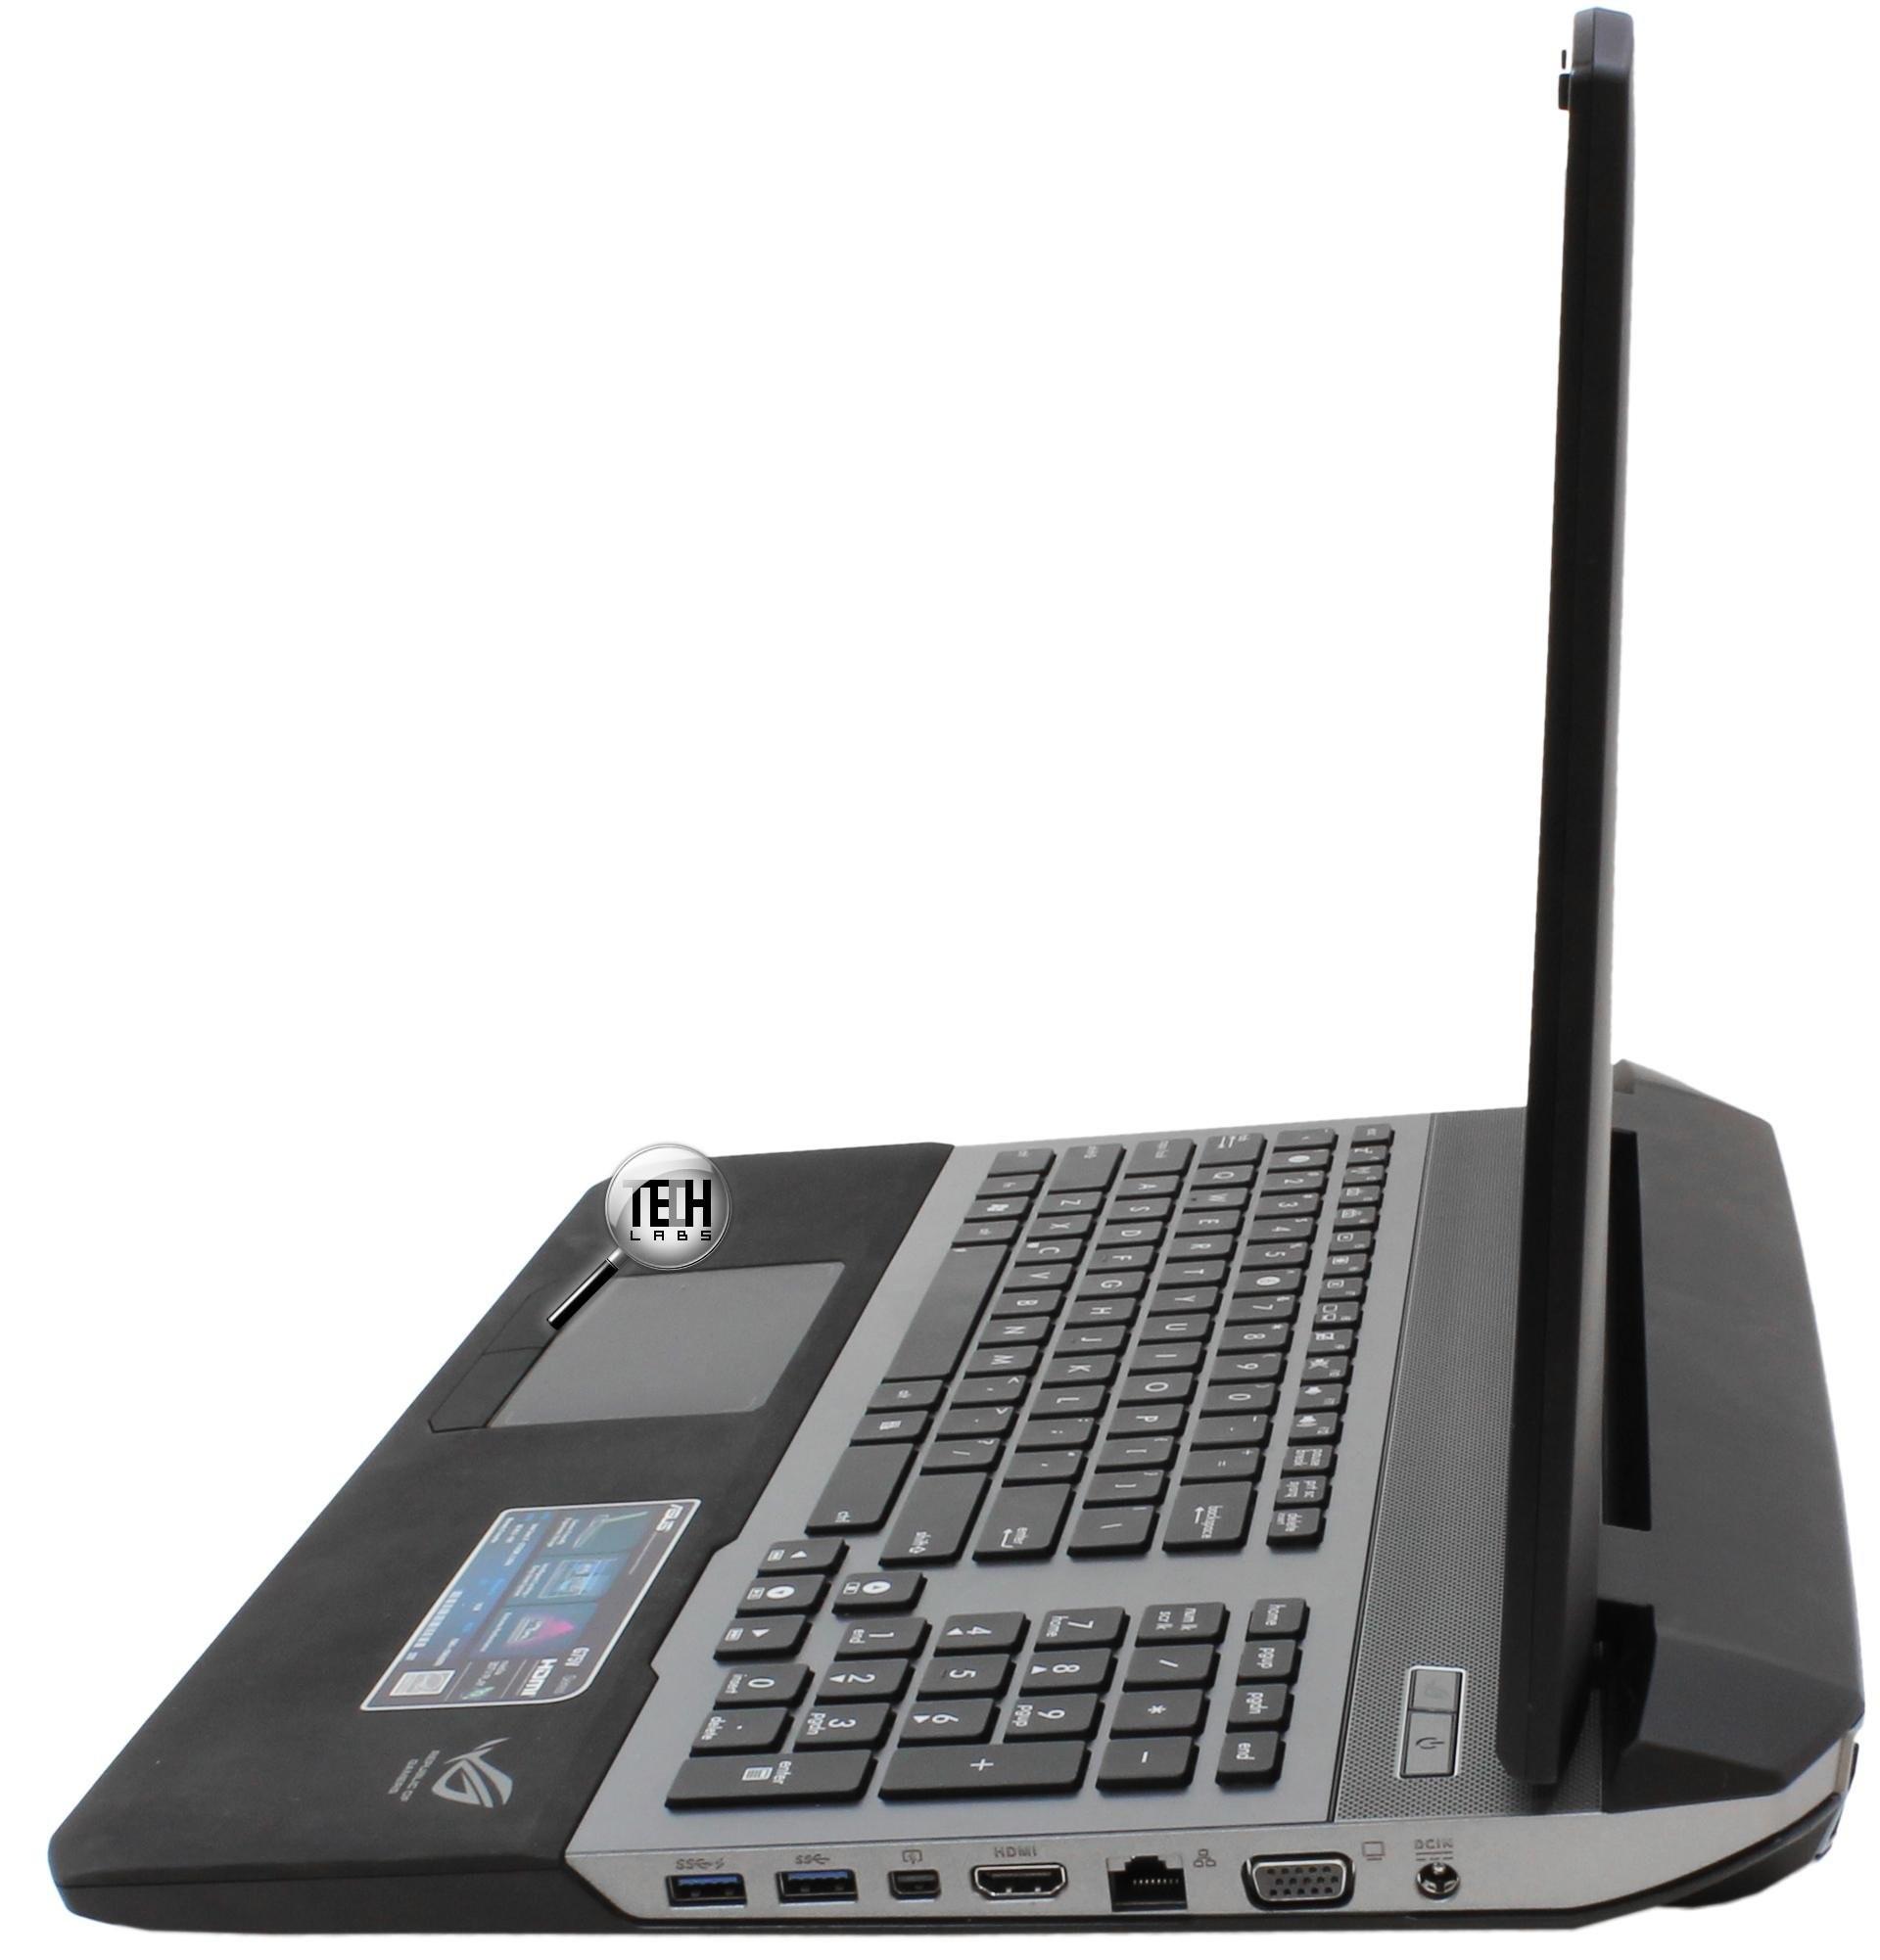 tonpc ma vente pc portable au maroc asus rog g75vw core i7. Black Bedroom Furniture Sets. Home Design Ideas